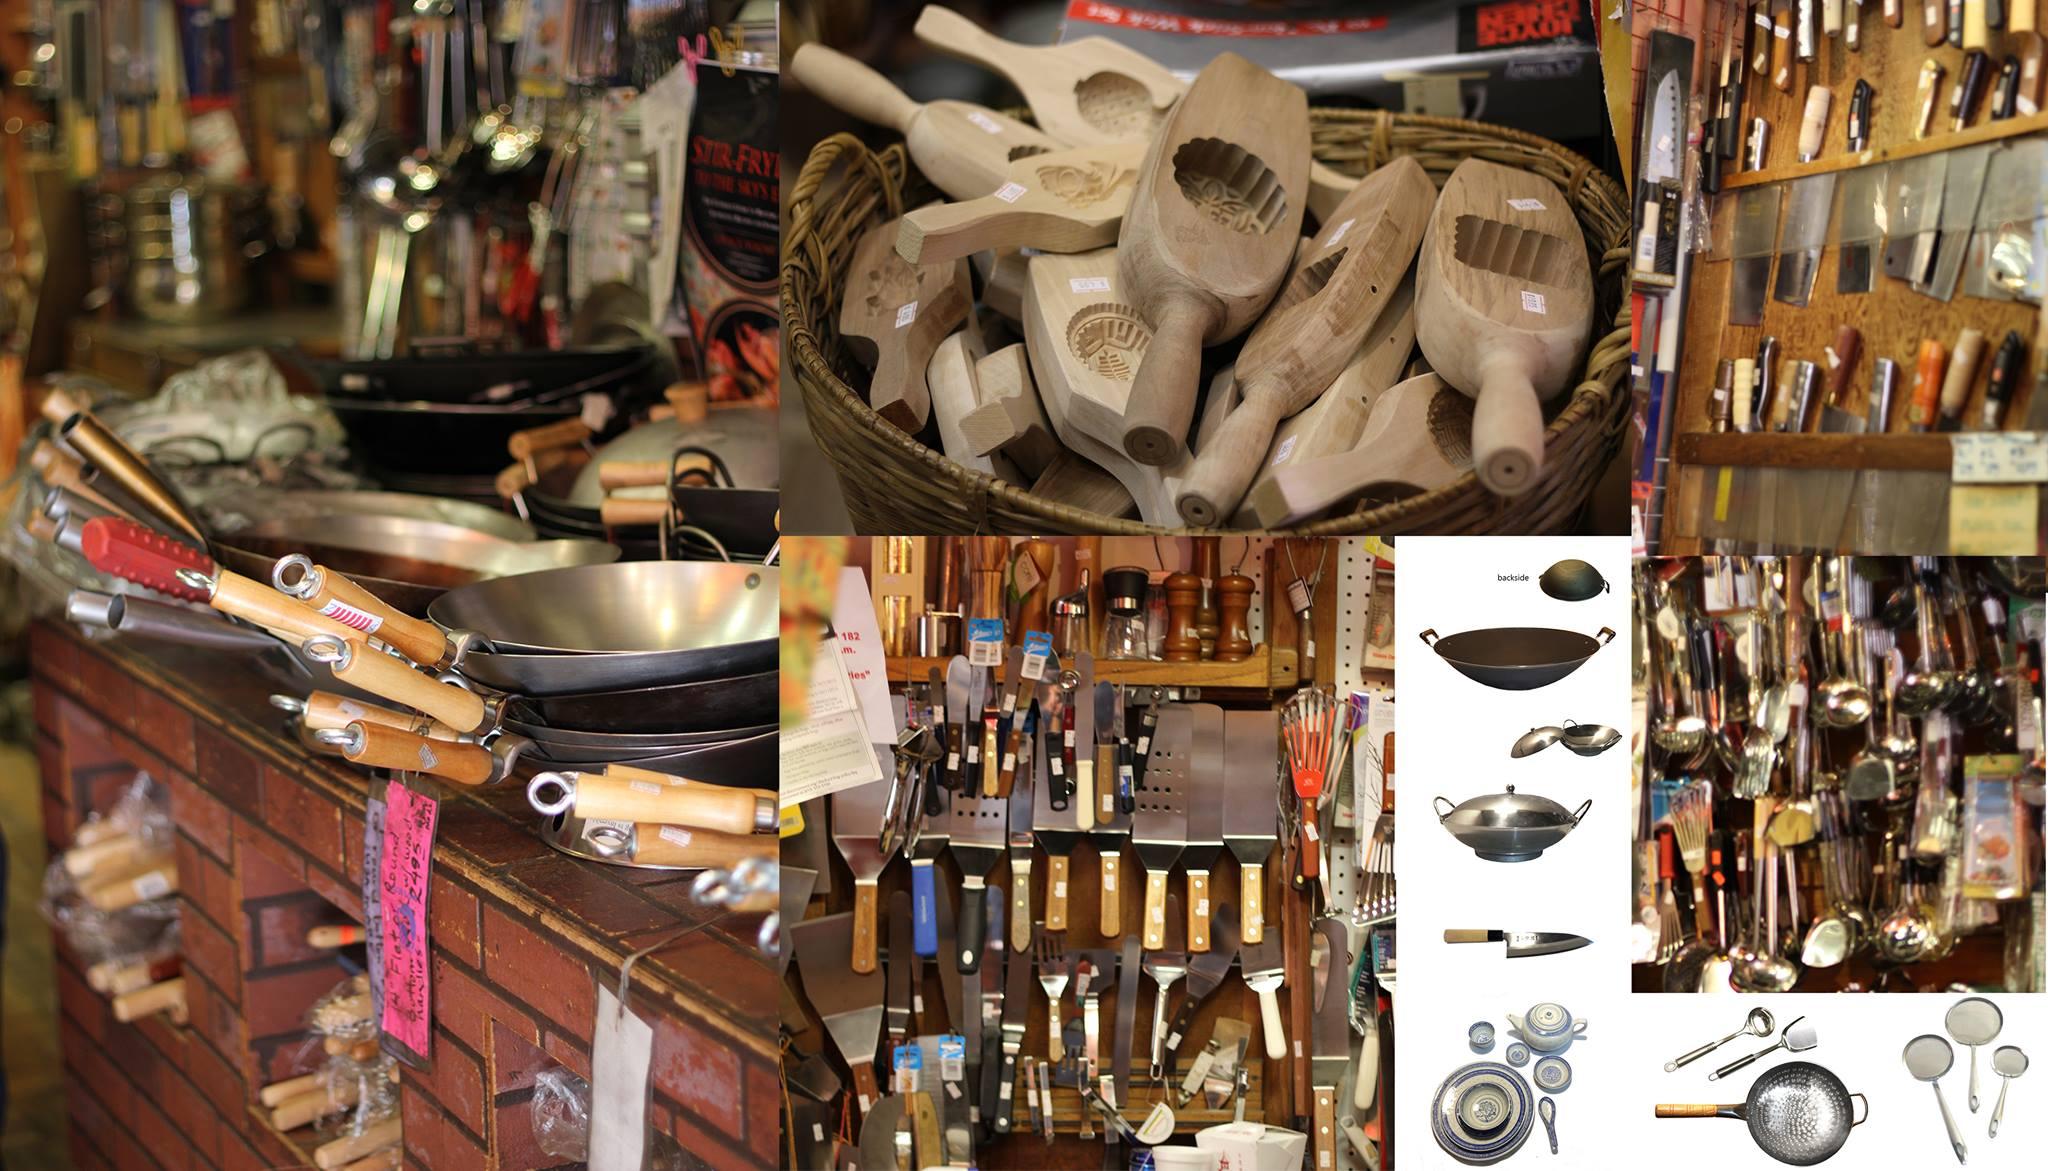 The Wok Shop – San Francisco kitchen supplies